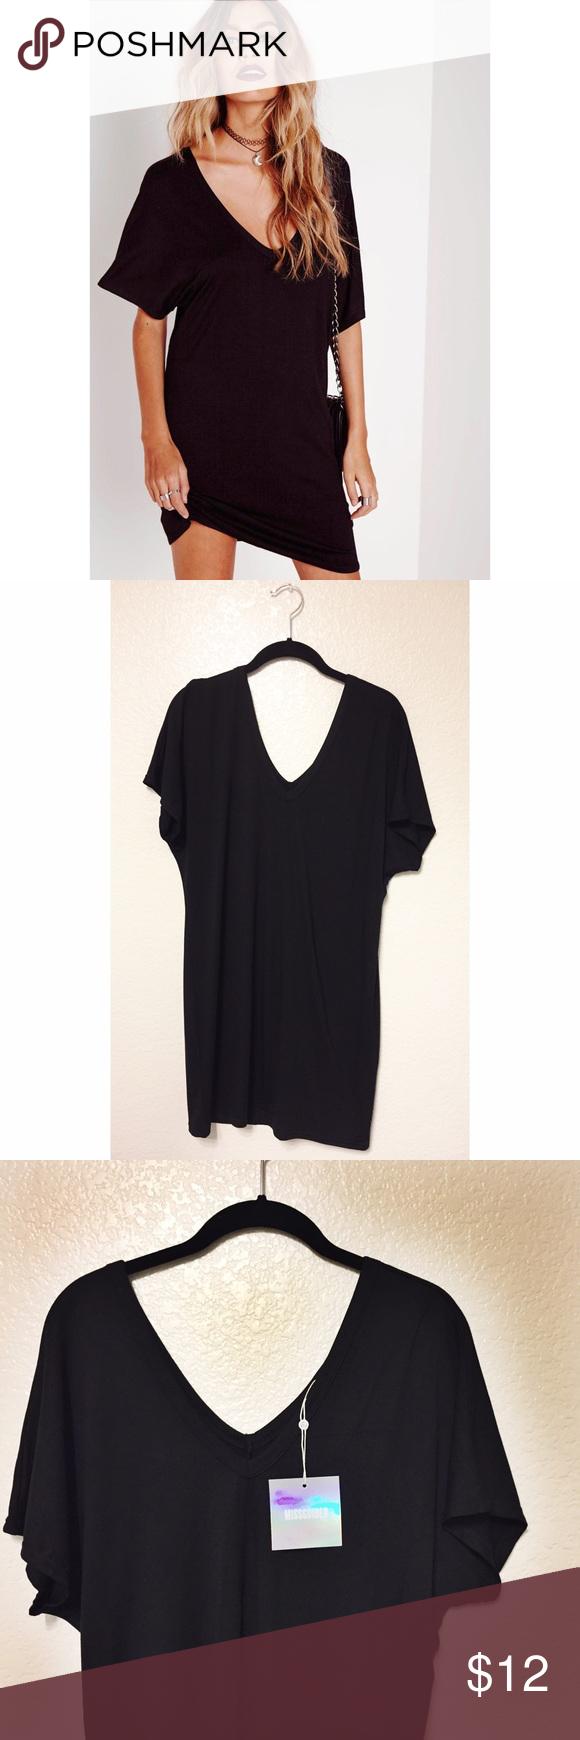 6490d9b25c Missguided Wide V Neck T-Shirt Dress (Black) Comfortable